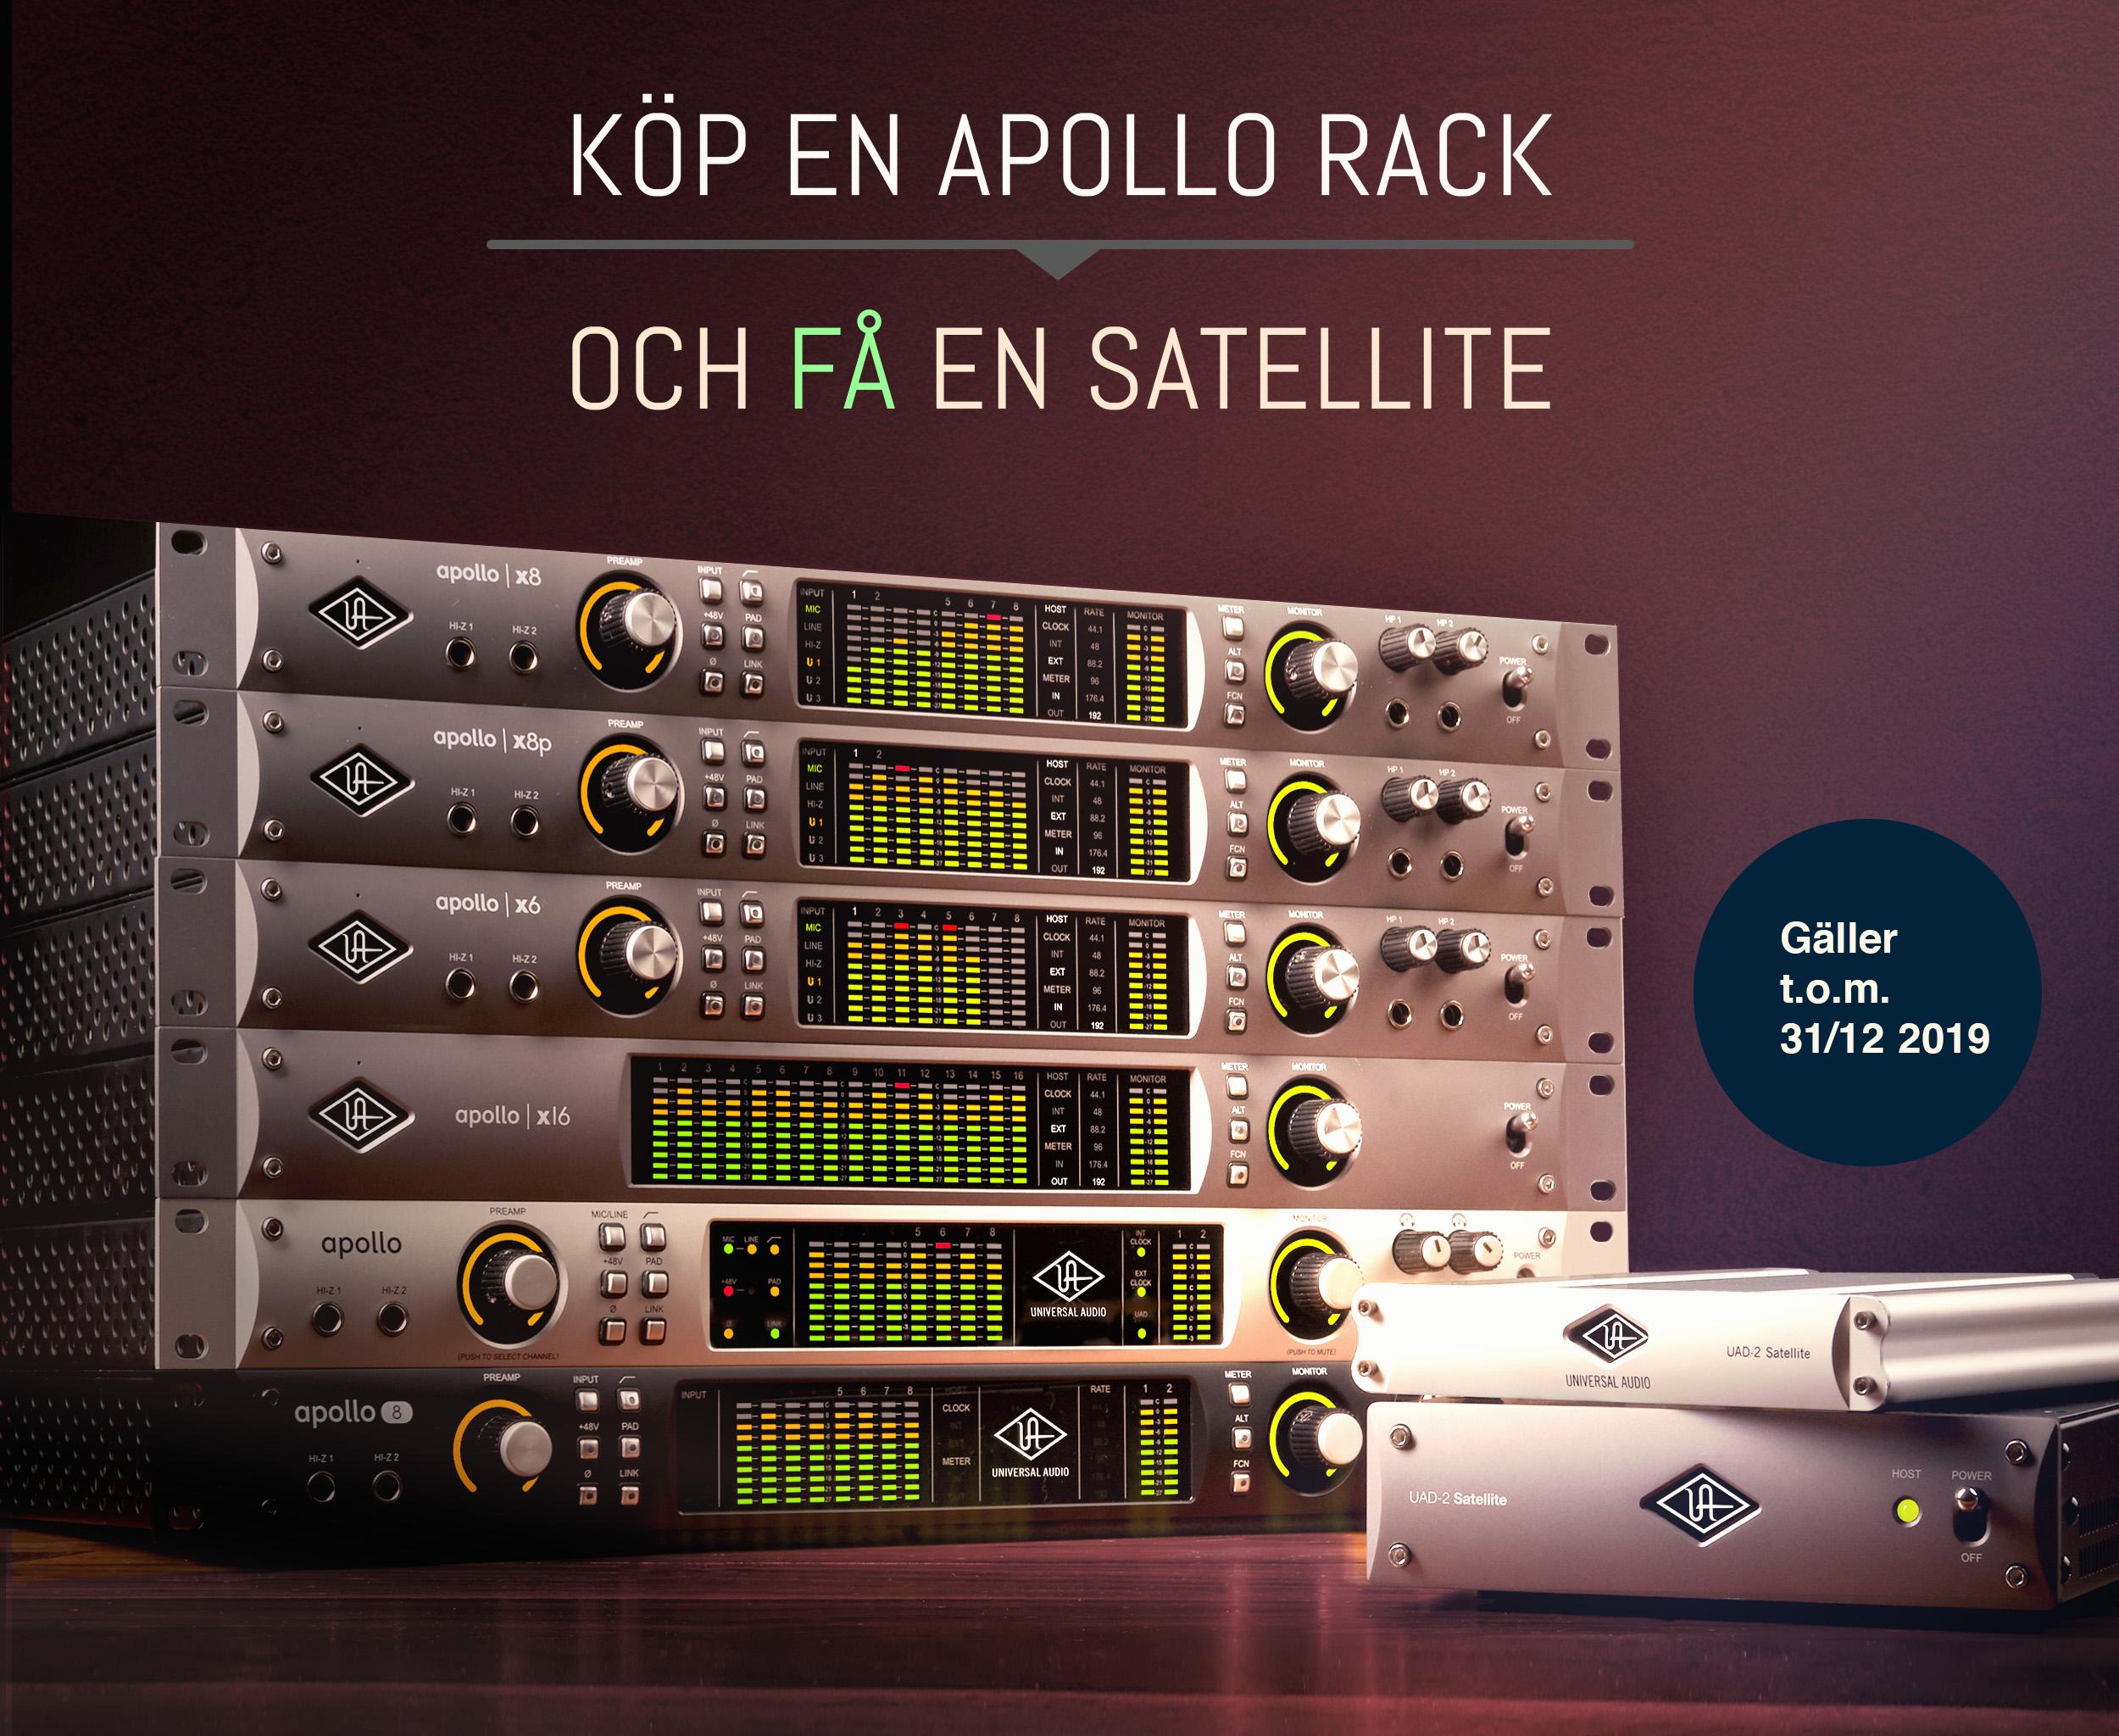 Universal Audio kampanj – Köp Apollo rack och få Satellite utan extra kostnad